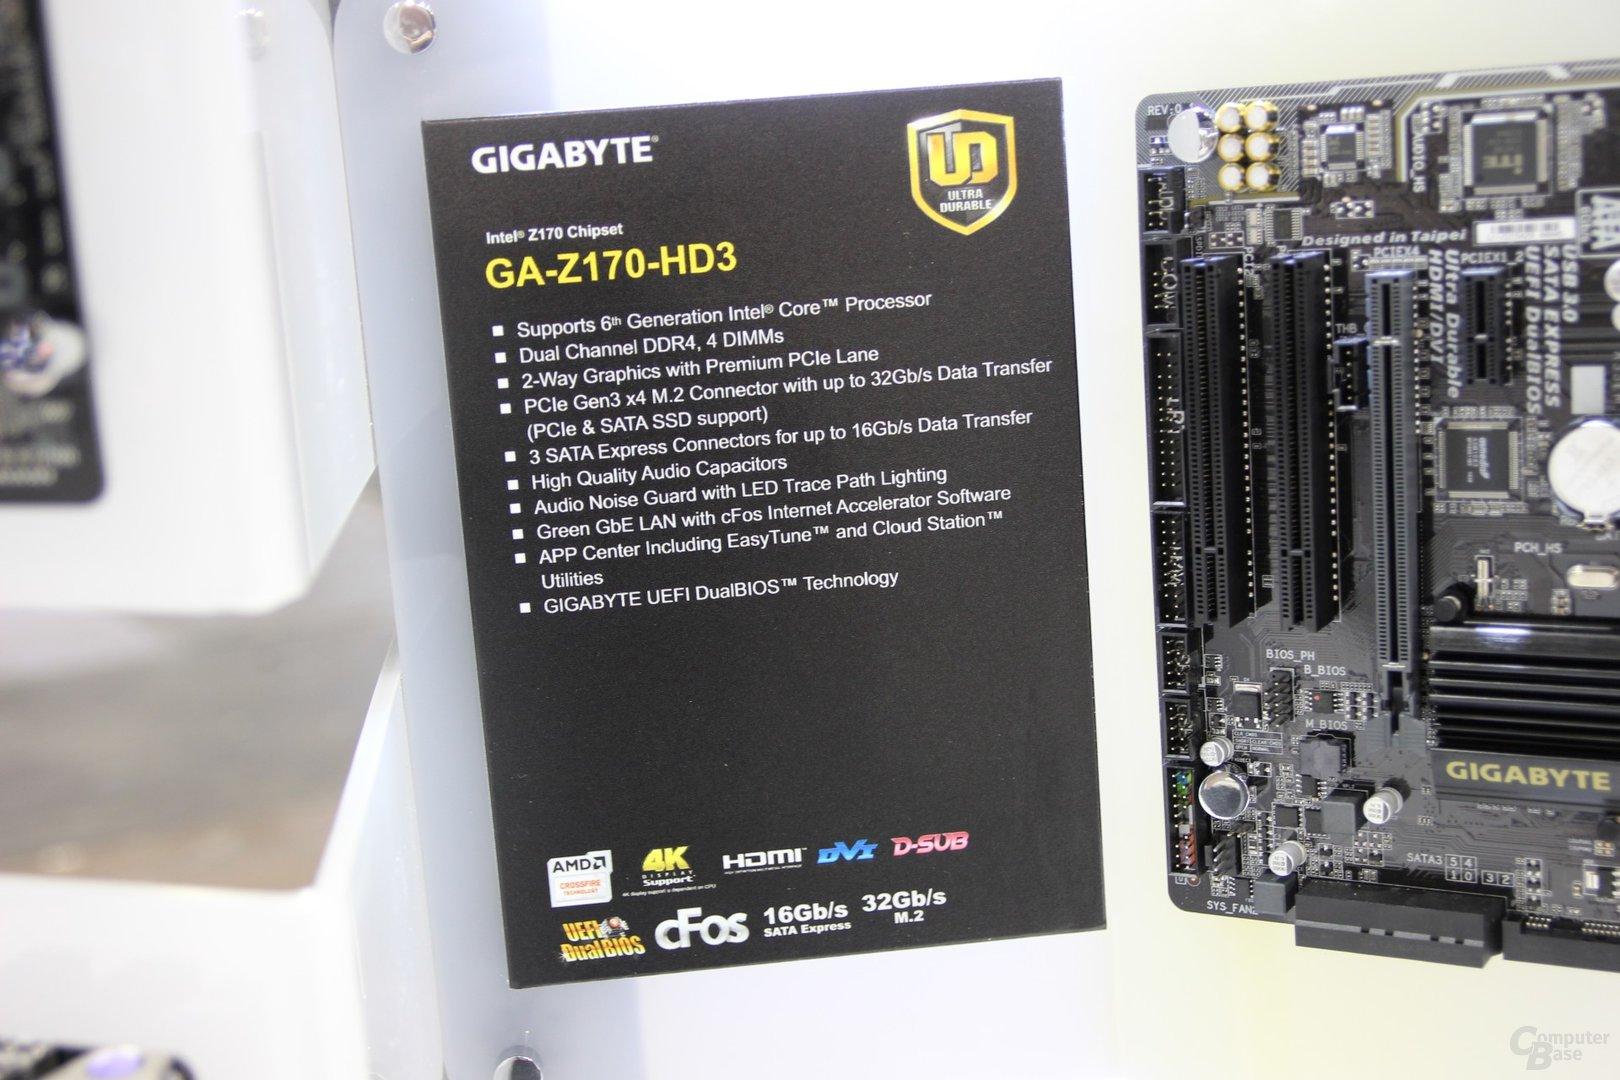 Spezifikationen des Gigabyte GA-Z170-HD3